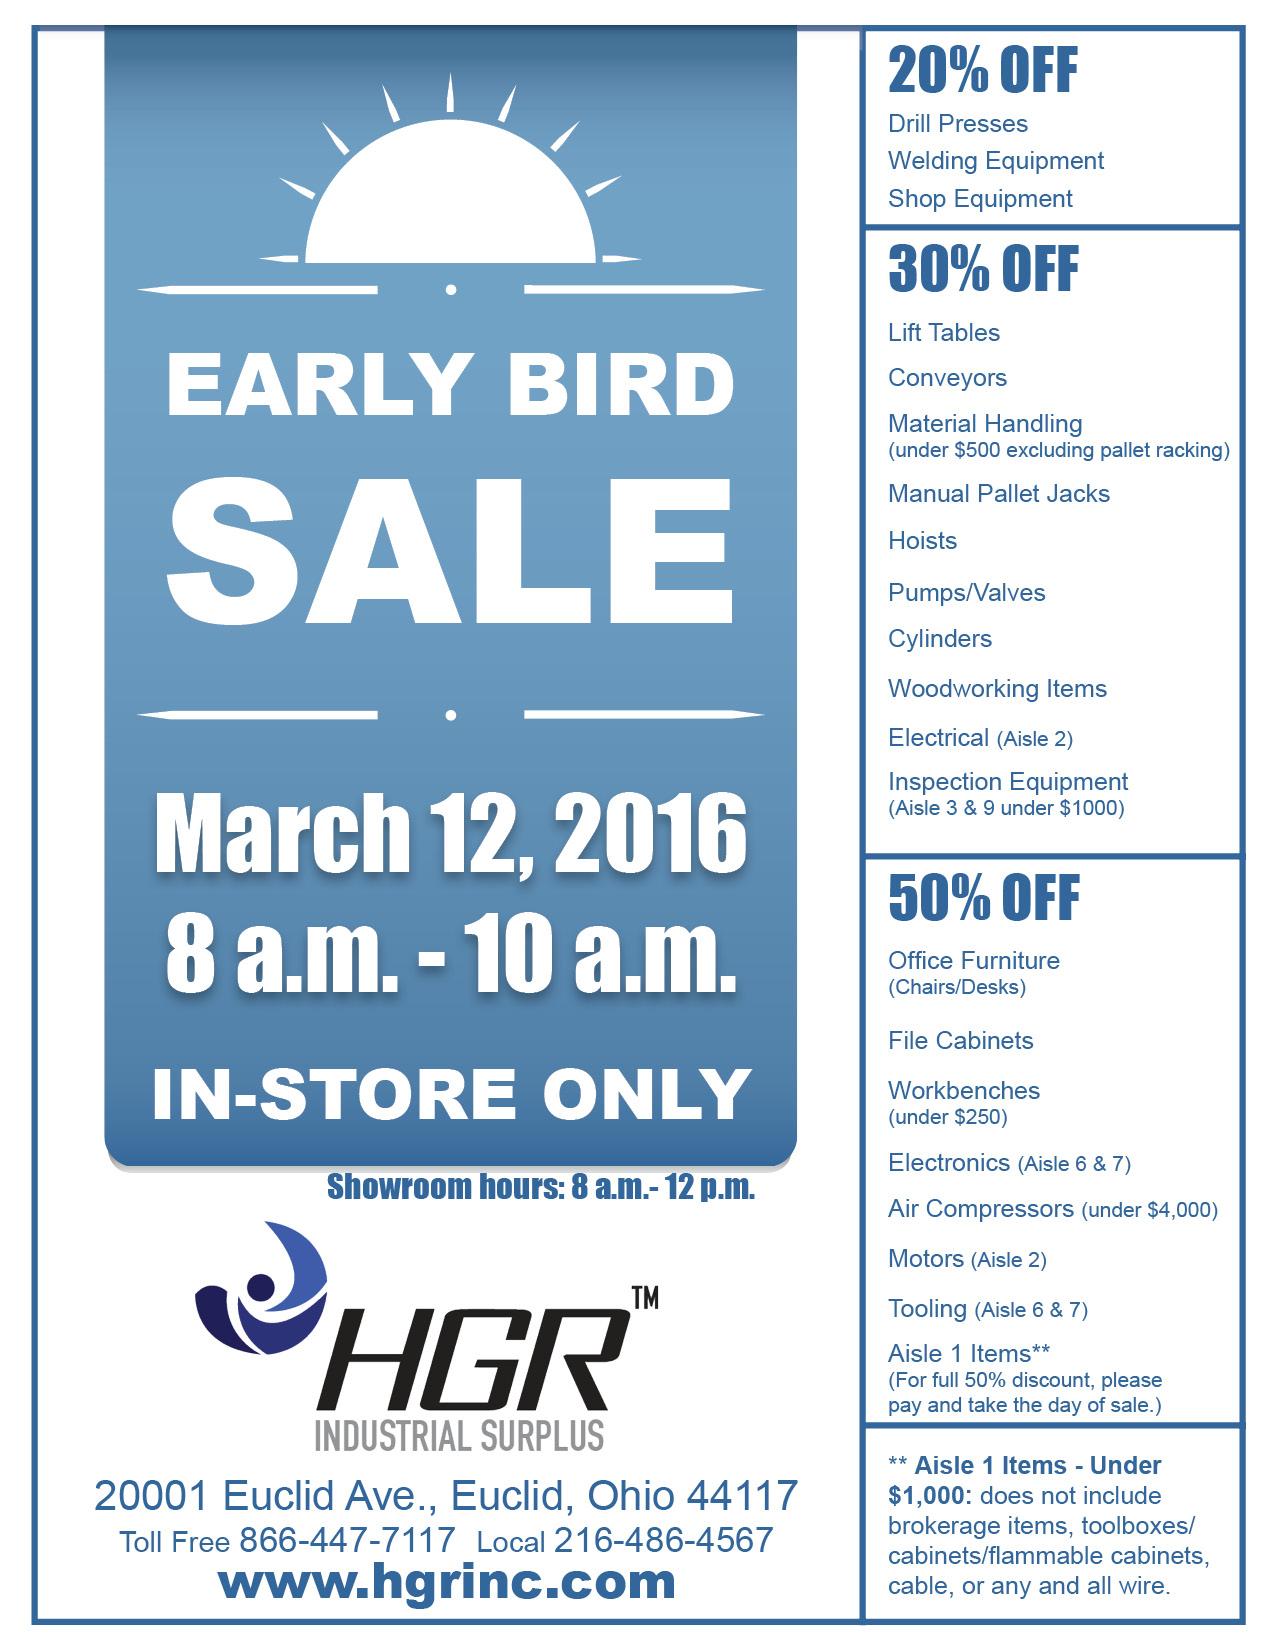 Early Bird Salg, mar 12